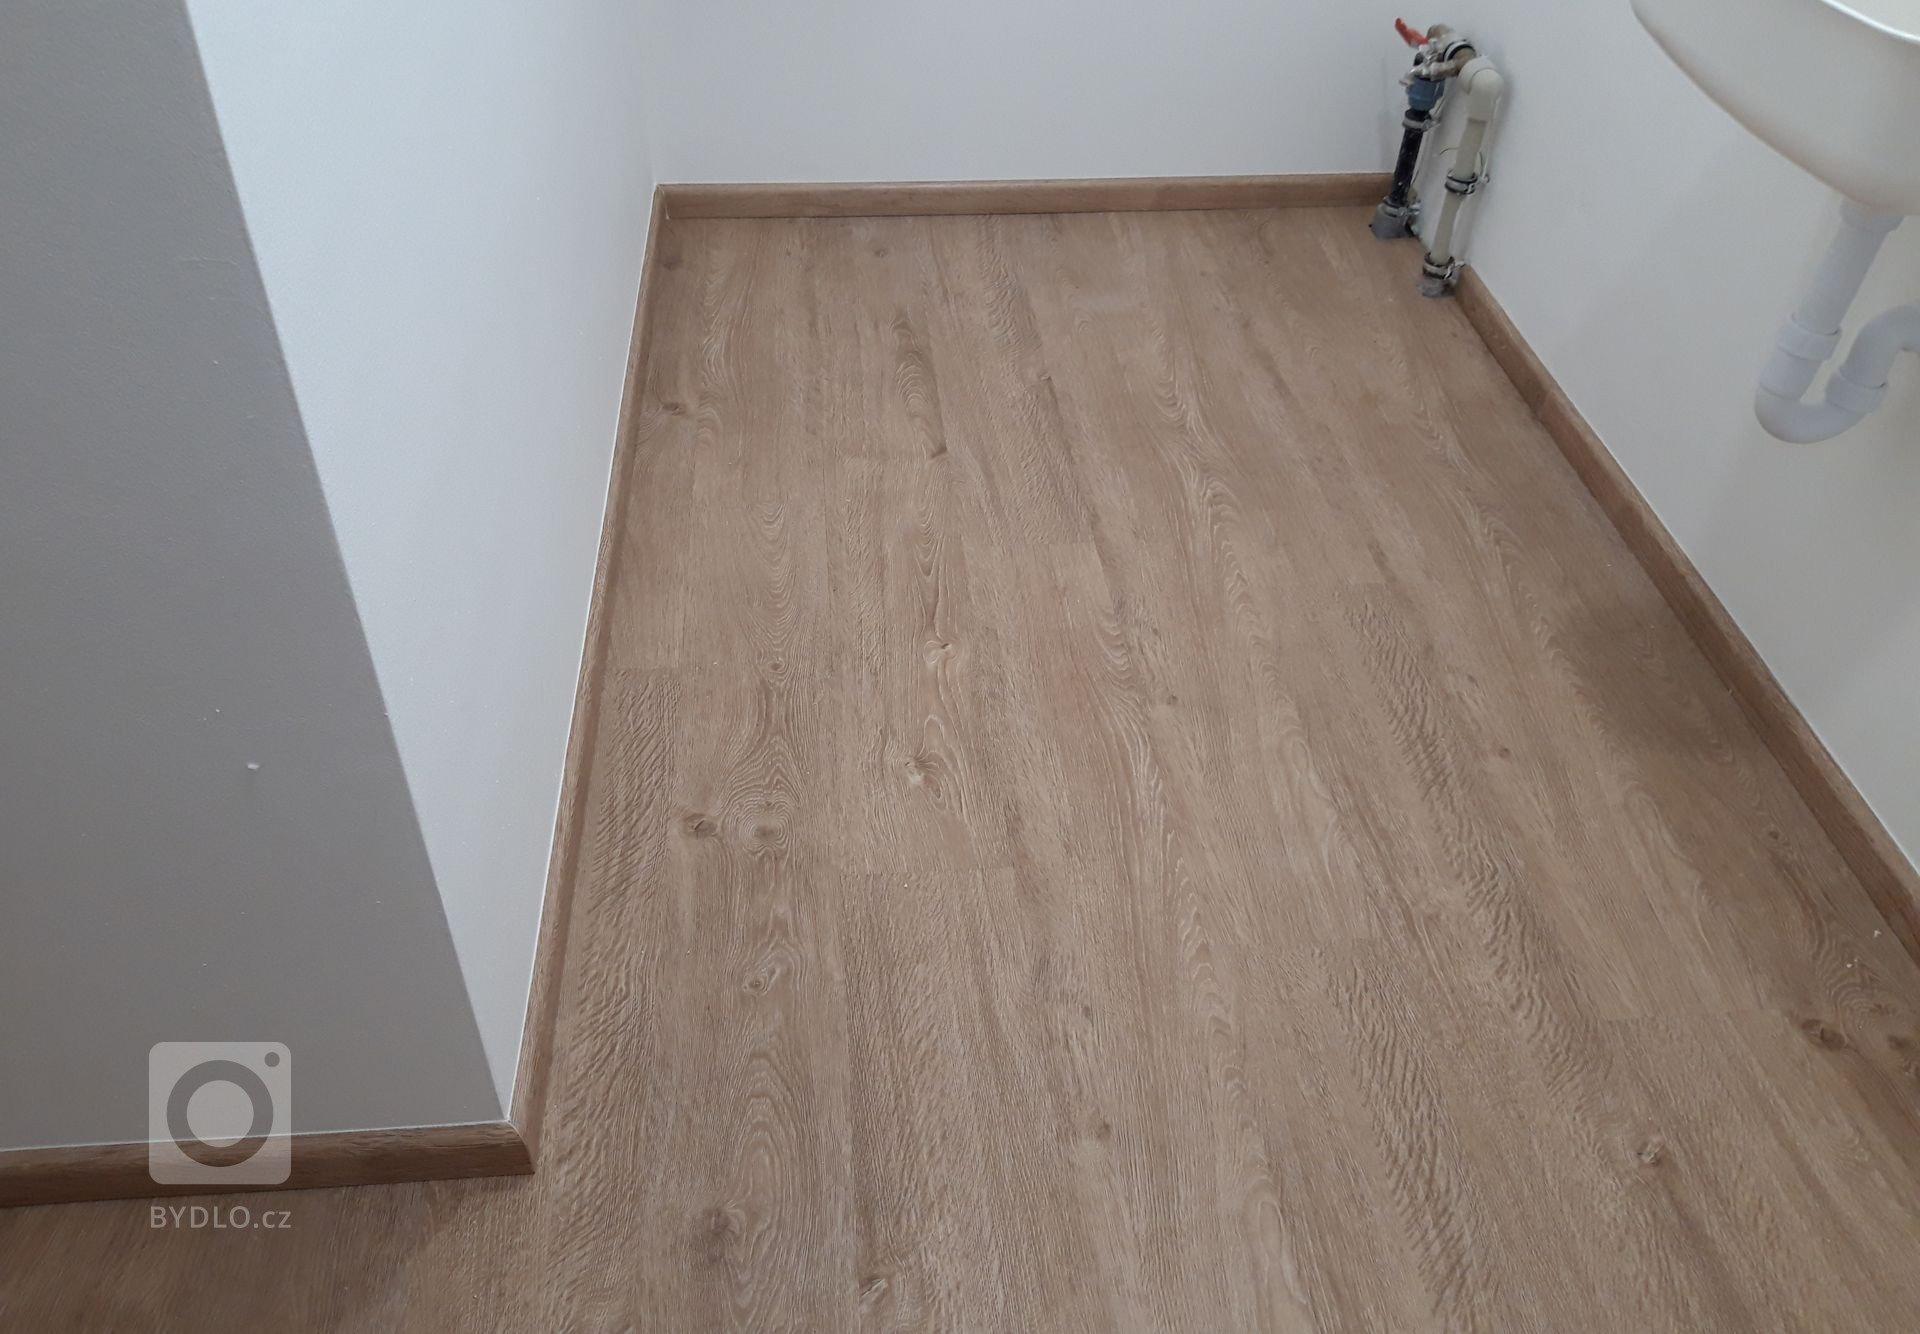 Vinylová podlaha BUKOMA PREMIUM CLICK se soklovými lištami BUKOMA PROFI-60 dekorem Dub Frigola